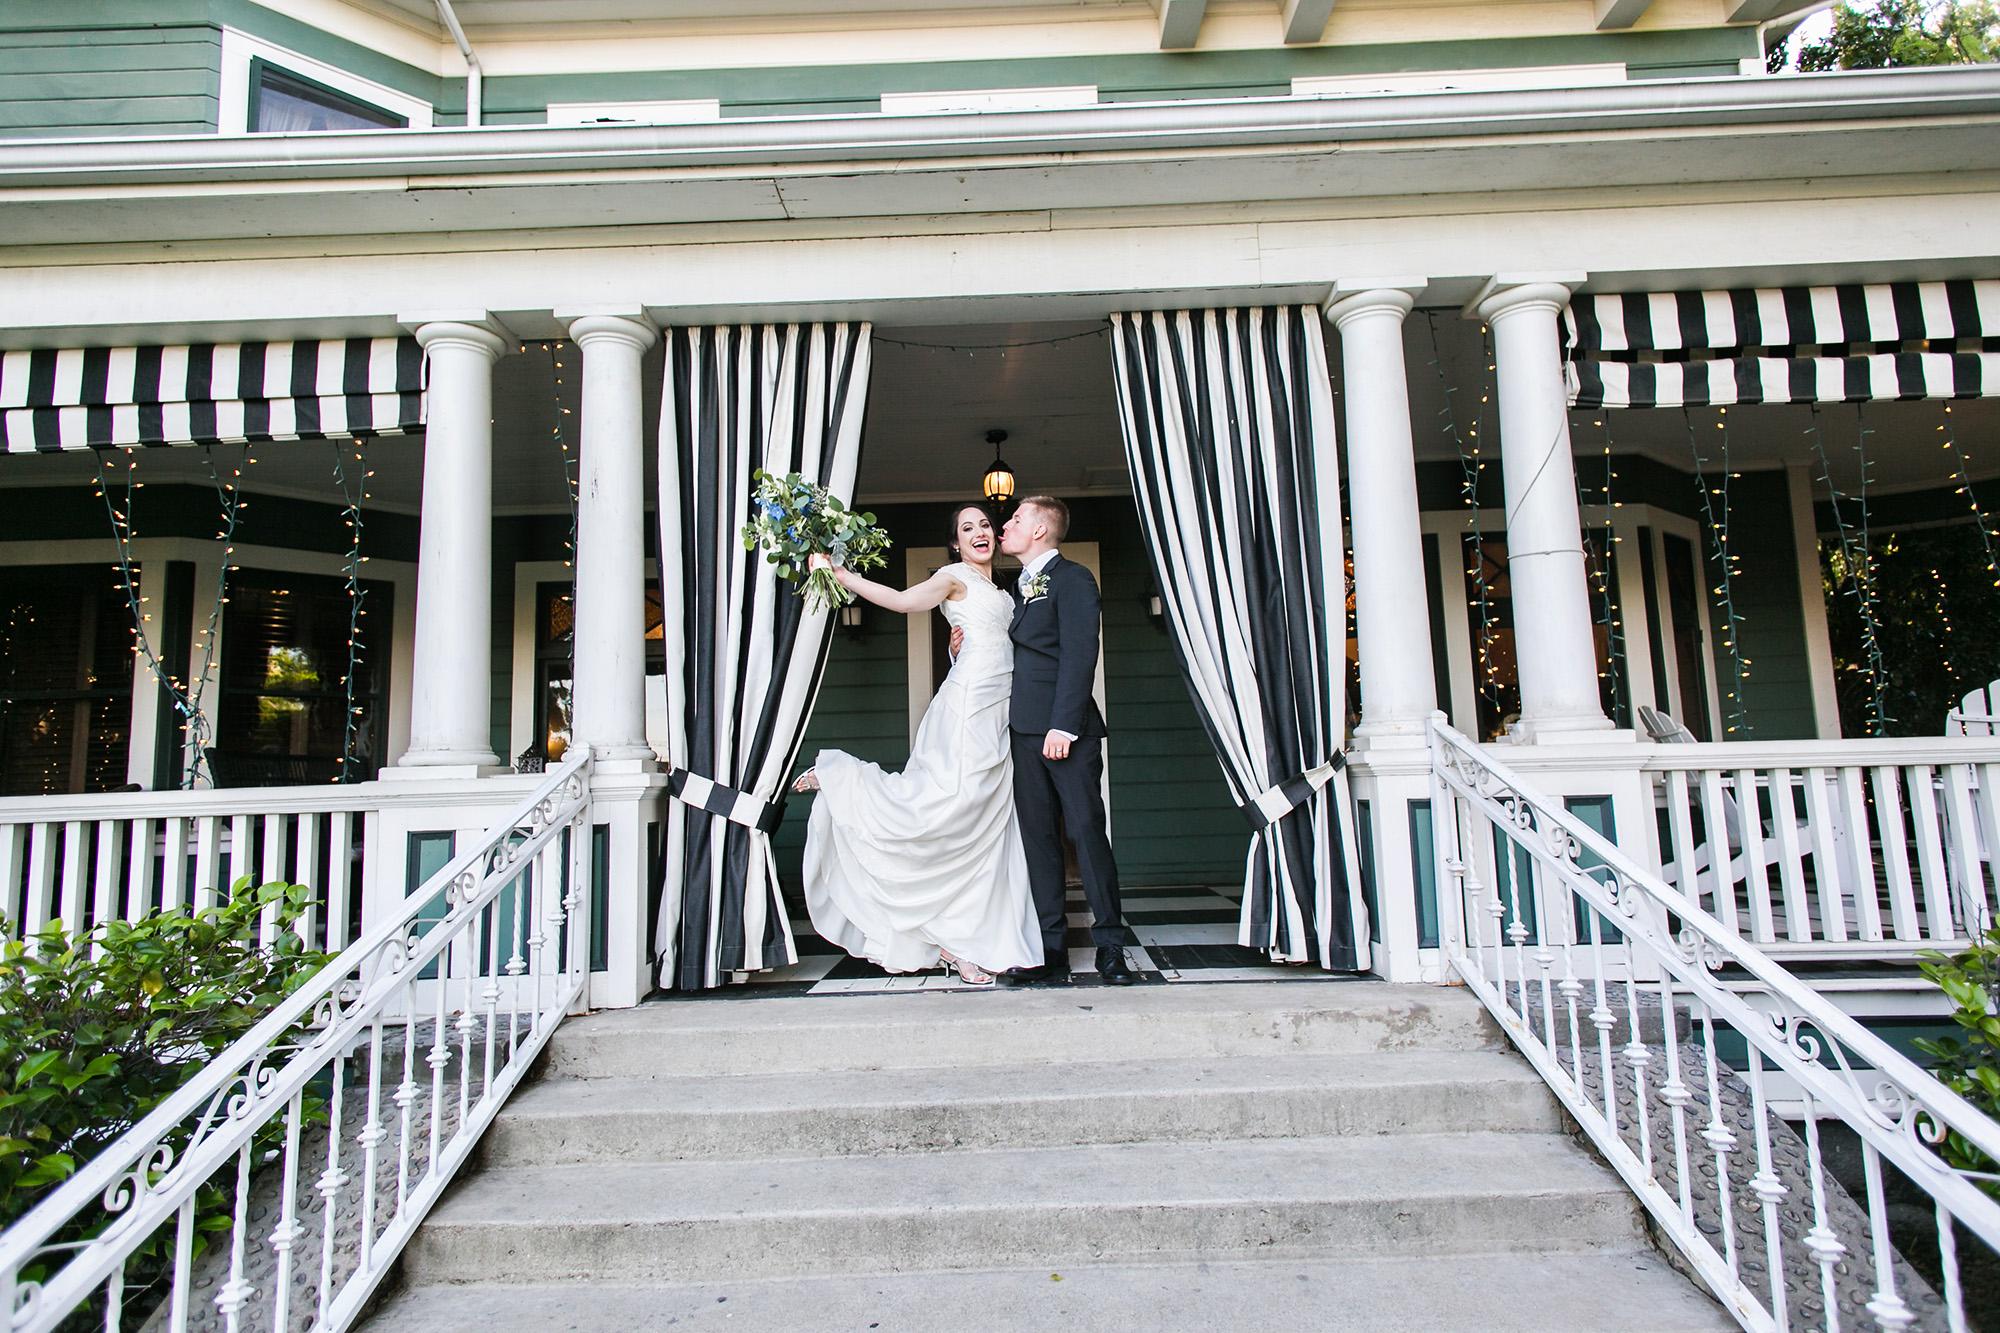 associate-photographer-christmas-house-wedding-carrie-vines-0106.jpg